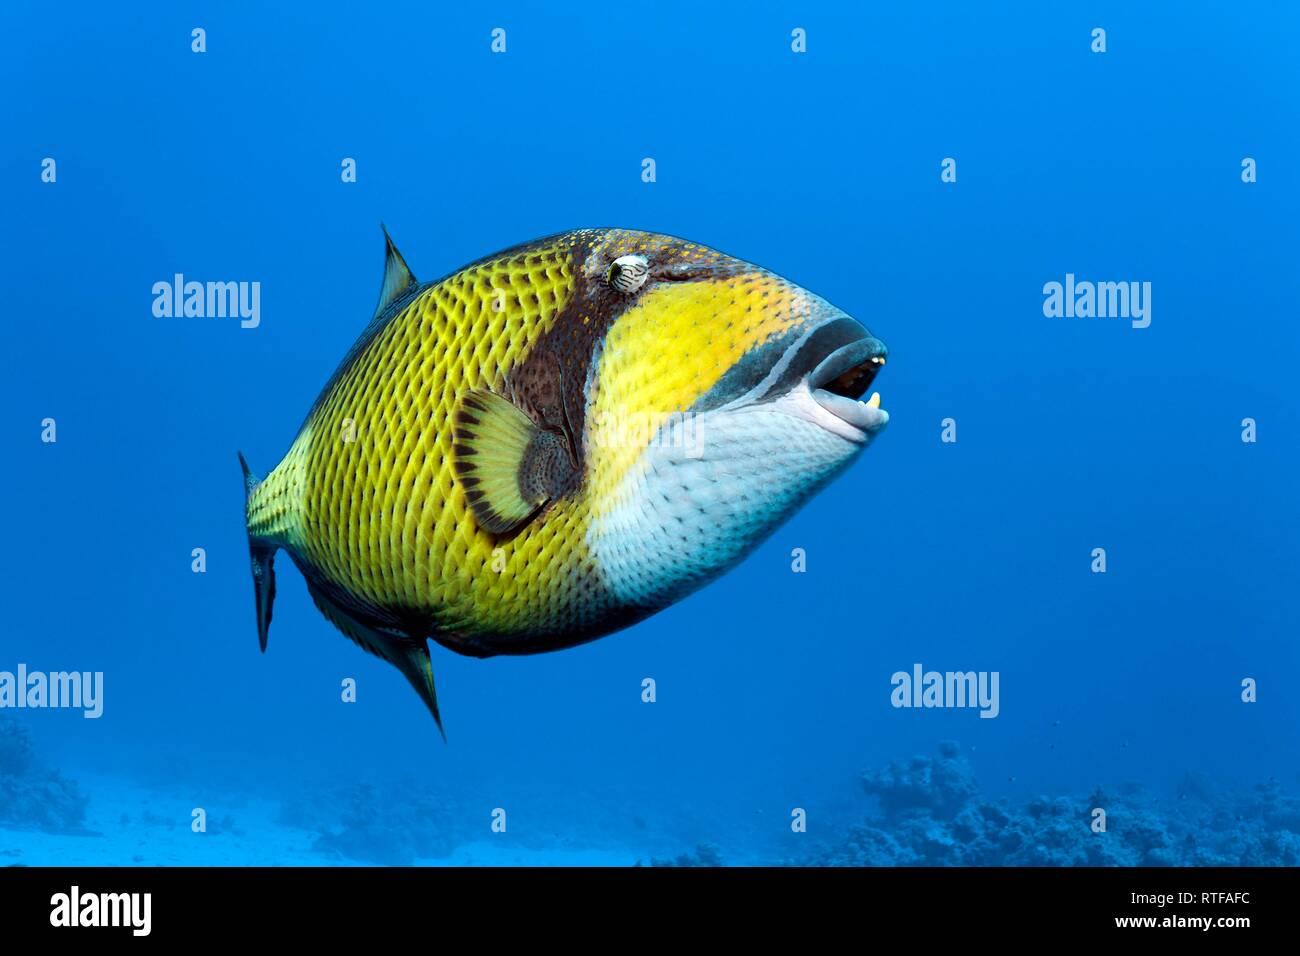 Titan triggerfish (Balistoides viridescens) swims in the open sea, Red Sea, Egypt - Stock Image